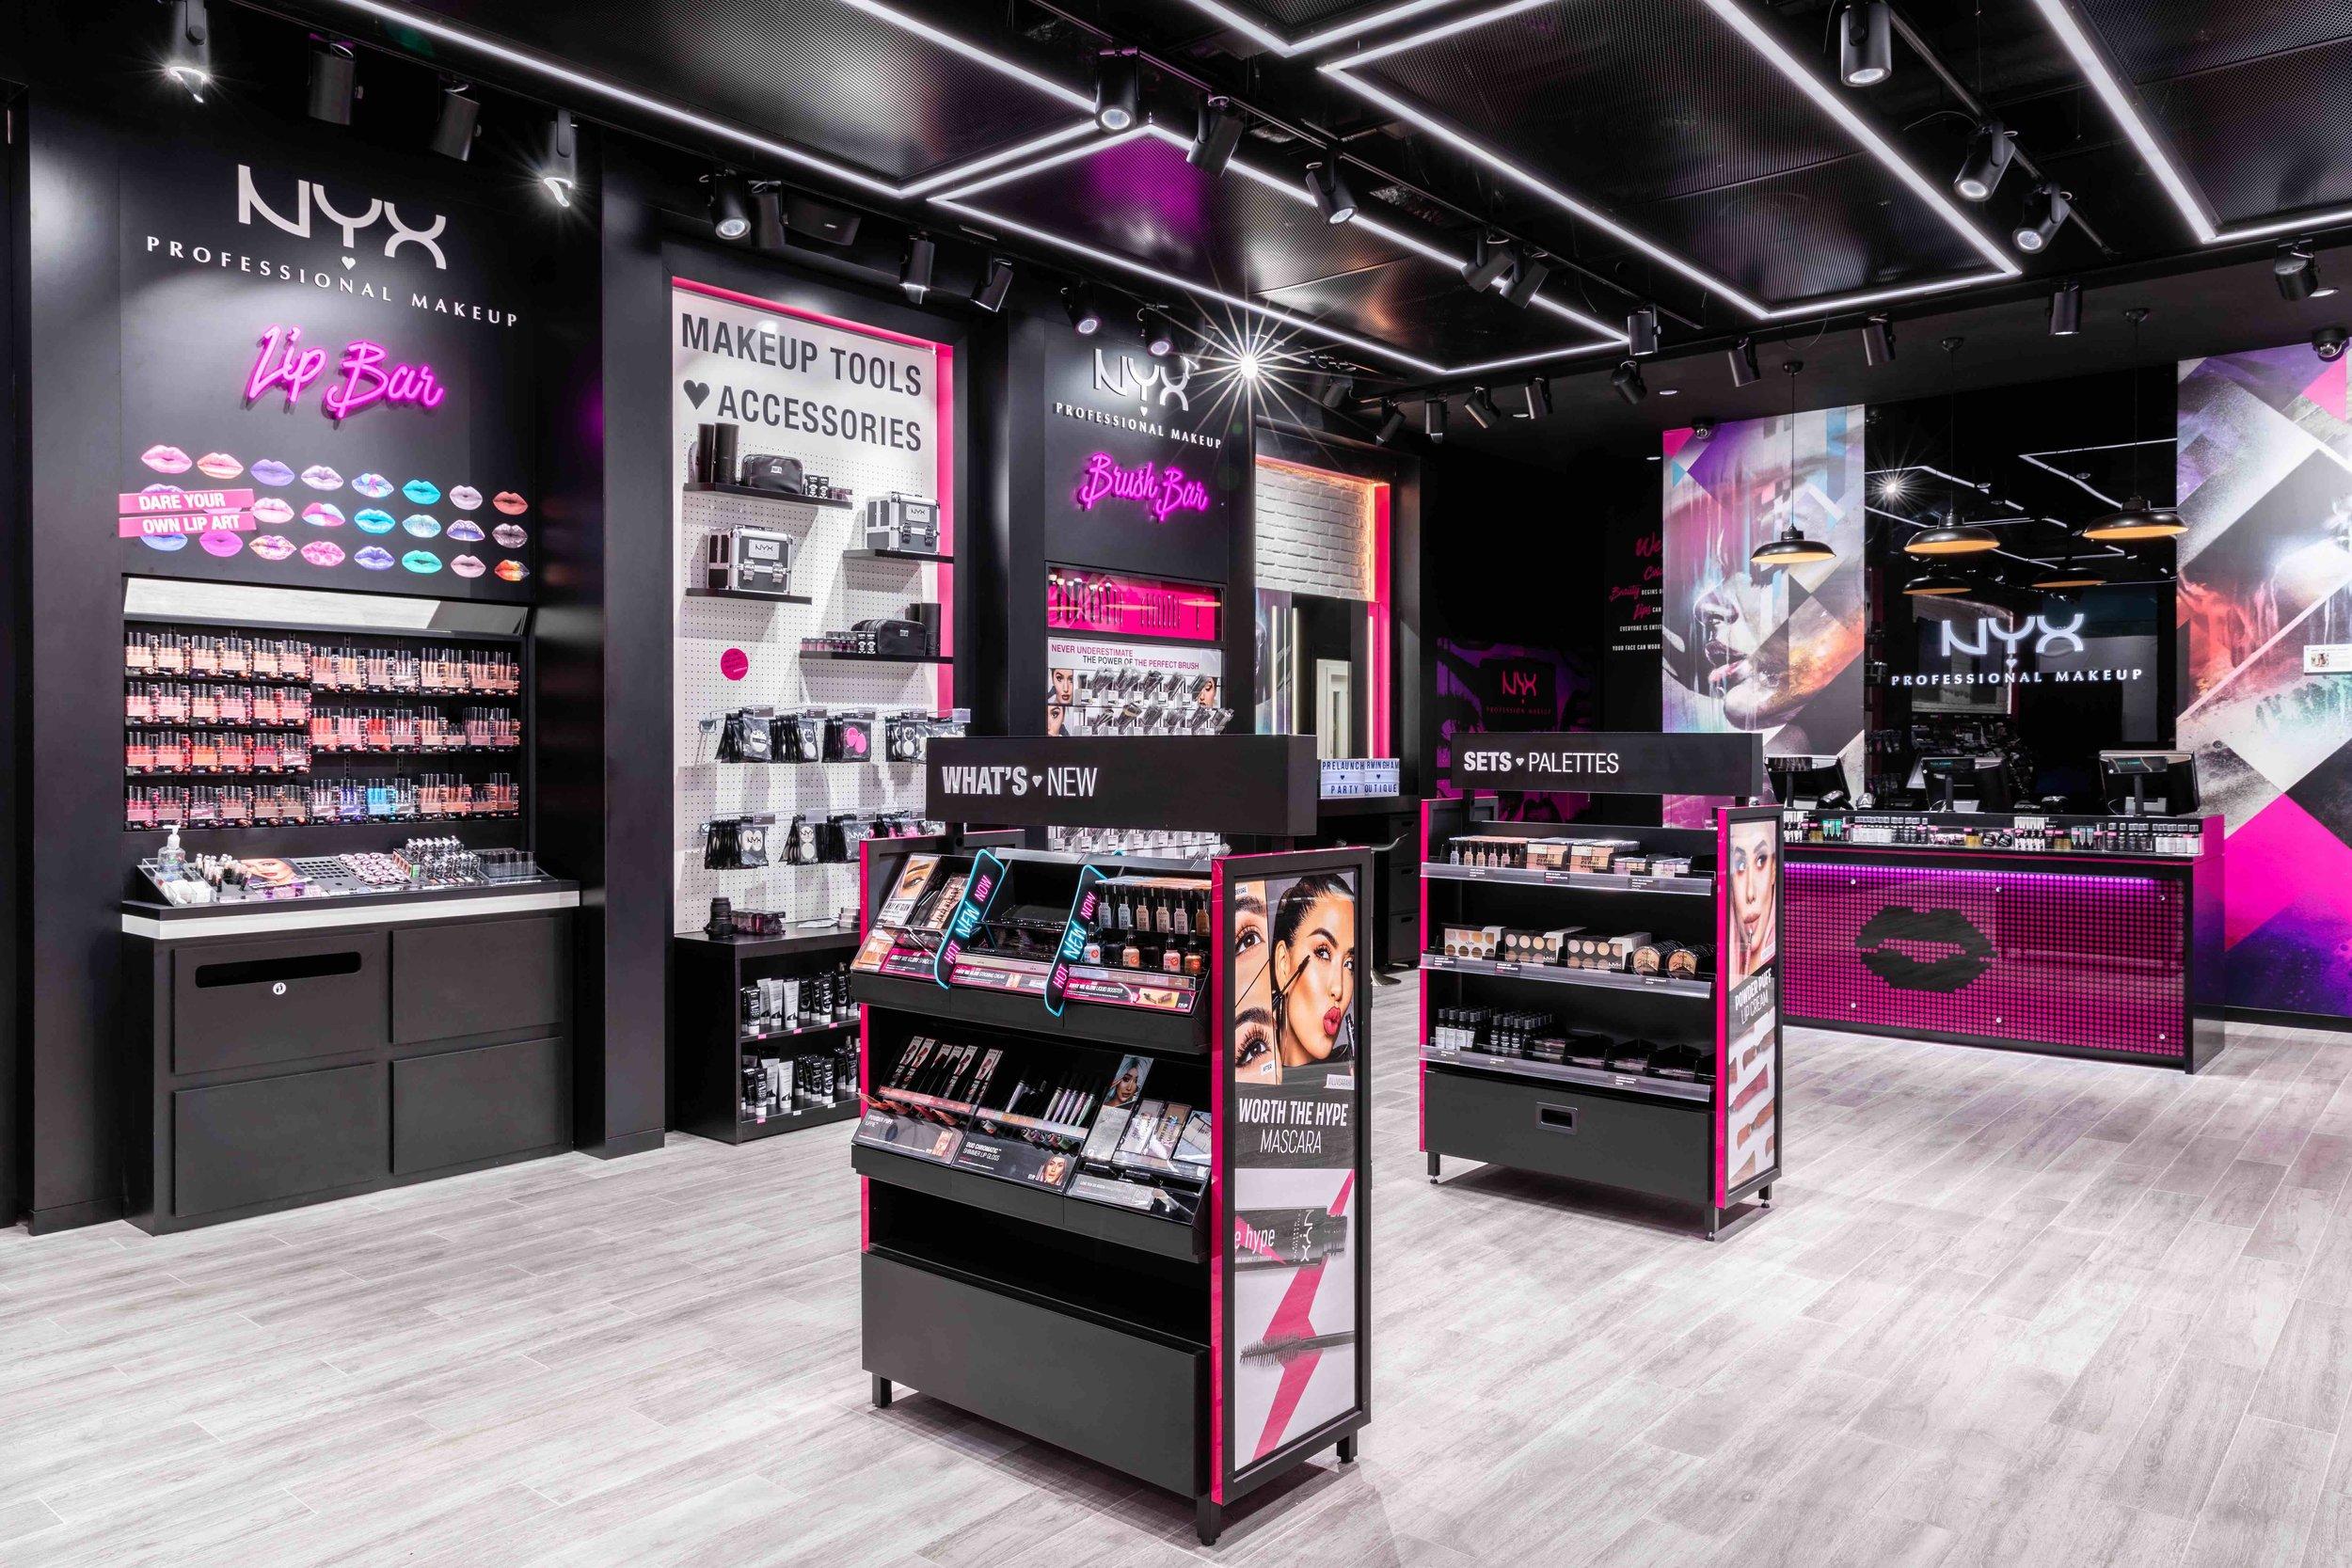 Bullring_NYX Professional Make-Up_June 2018_1.jpg